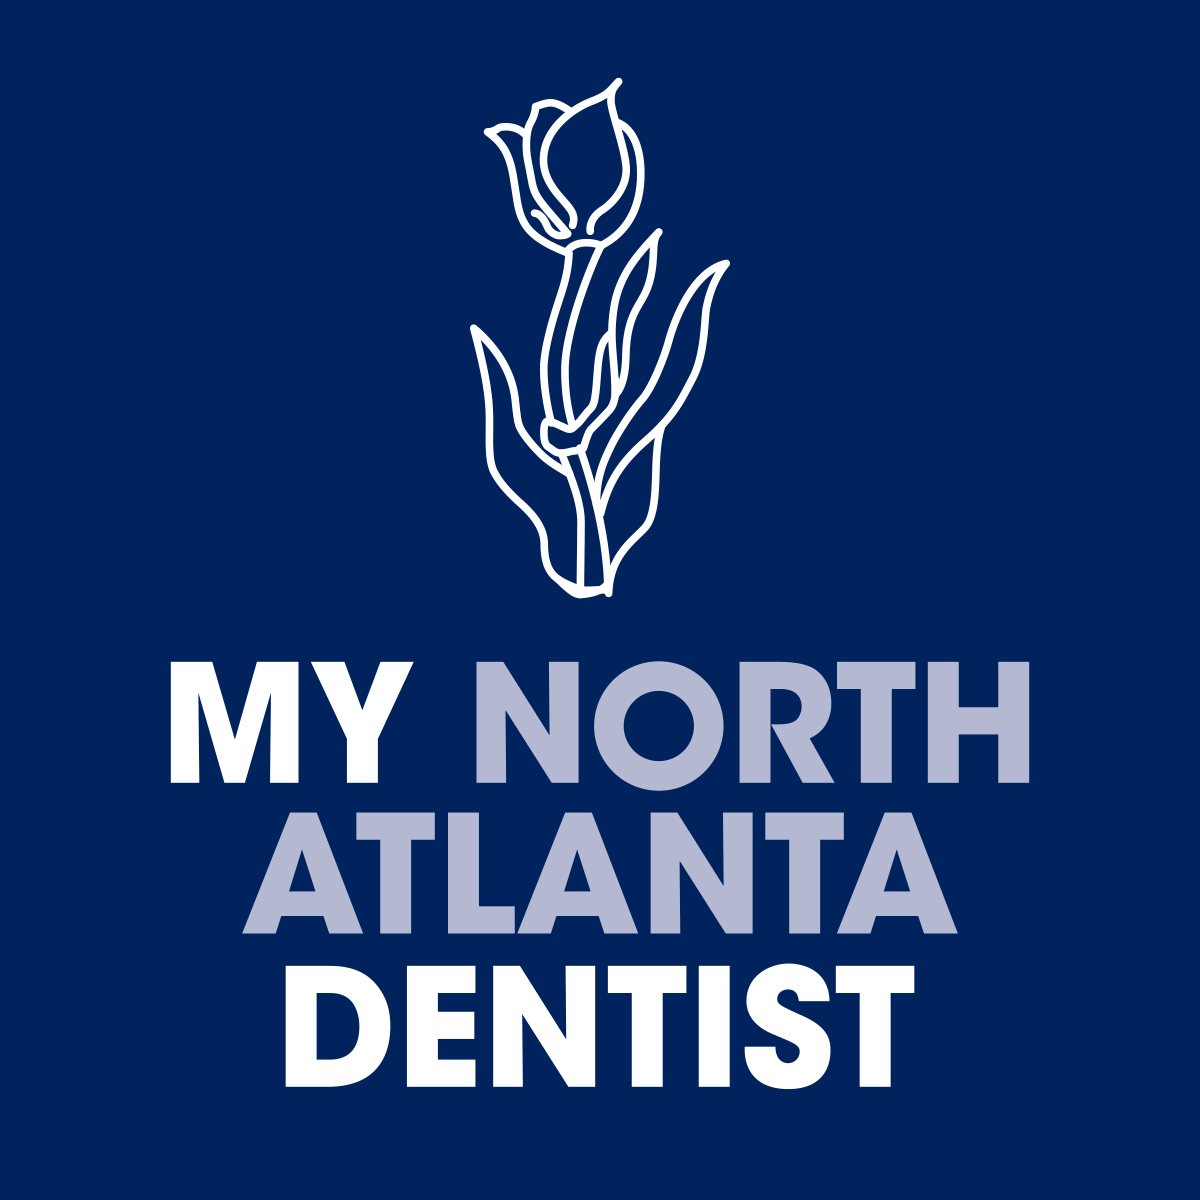 My North Atlanta Dentist